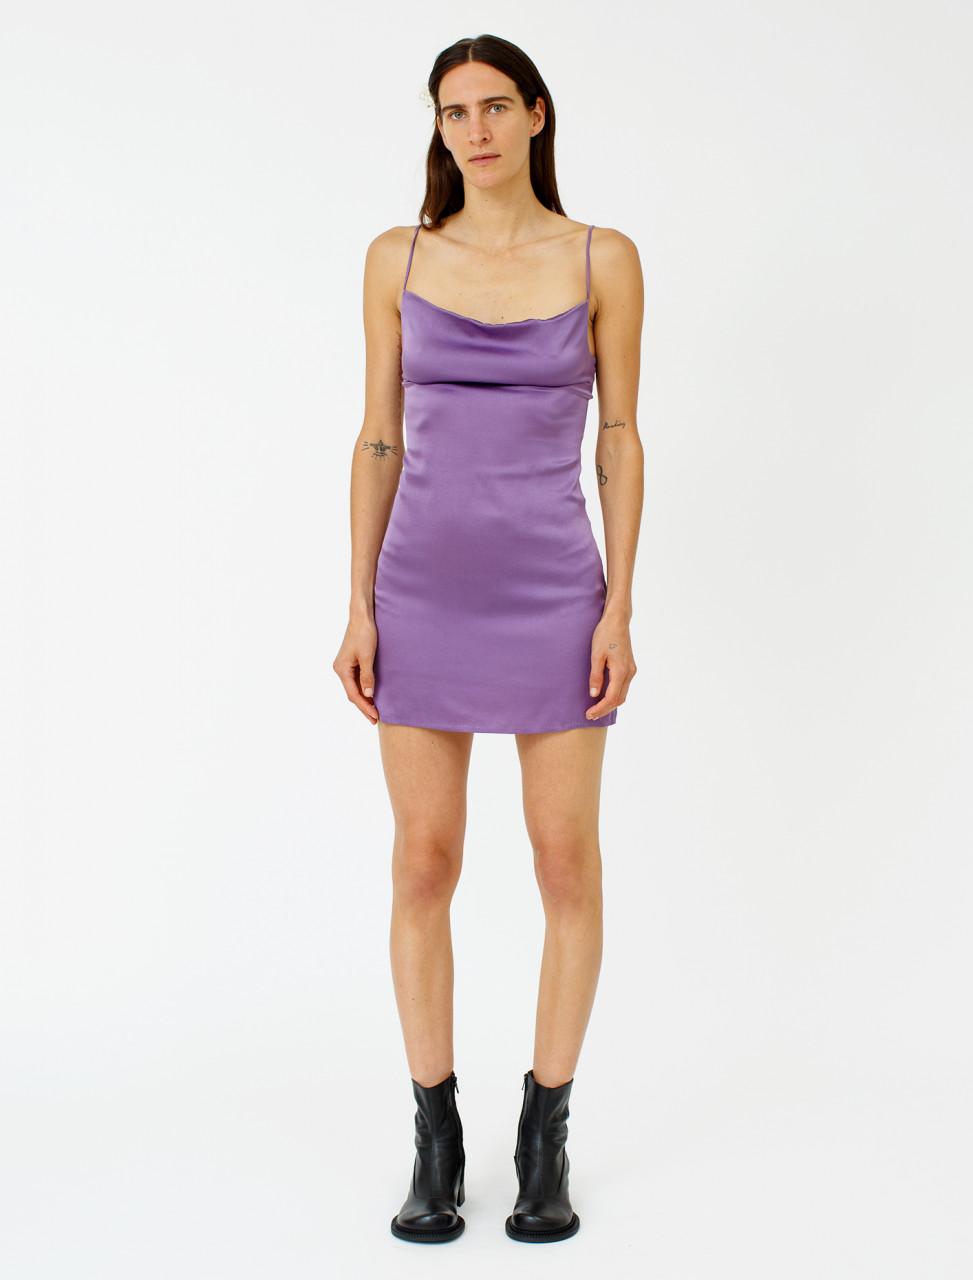 Altavista Dress